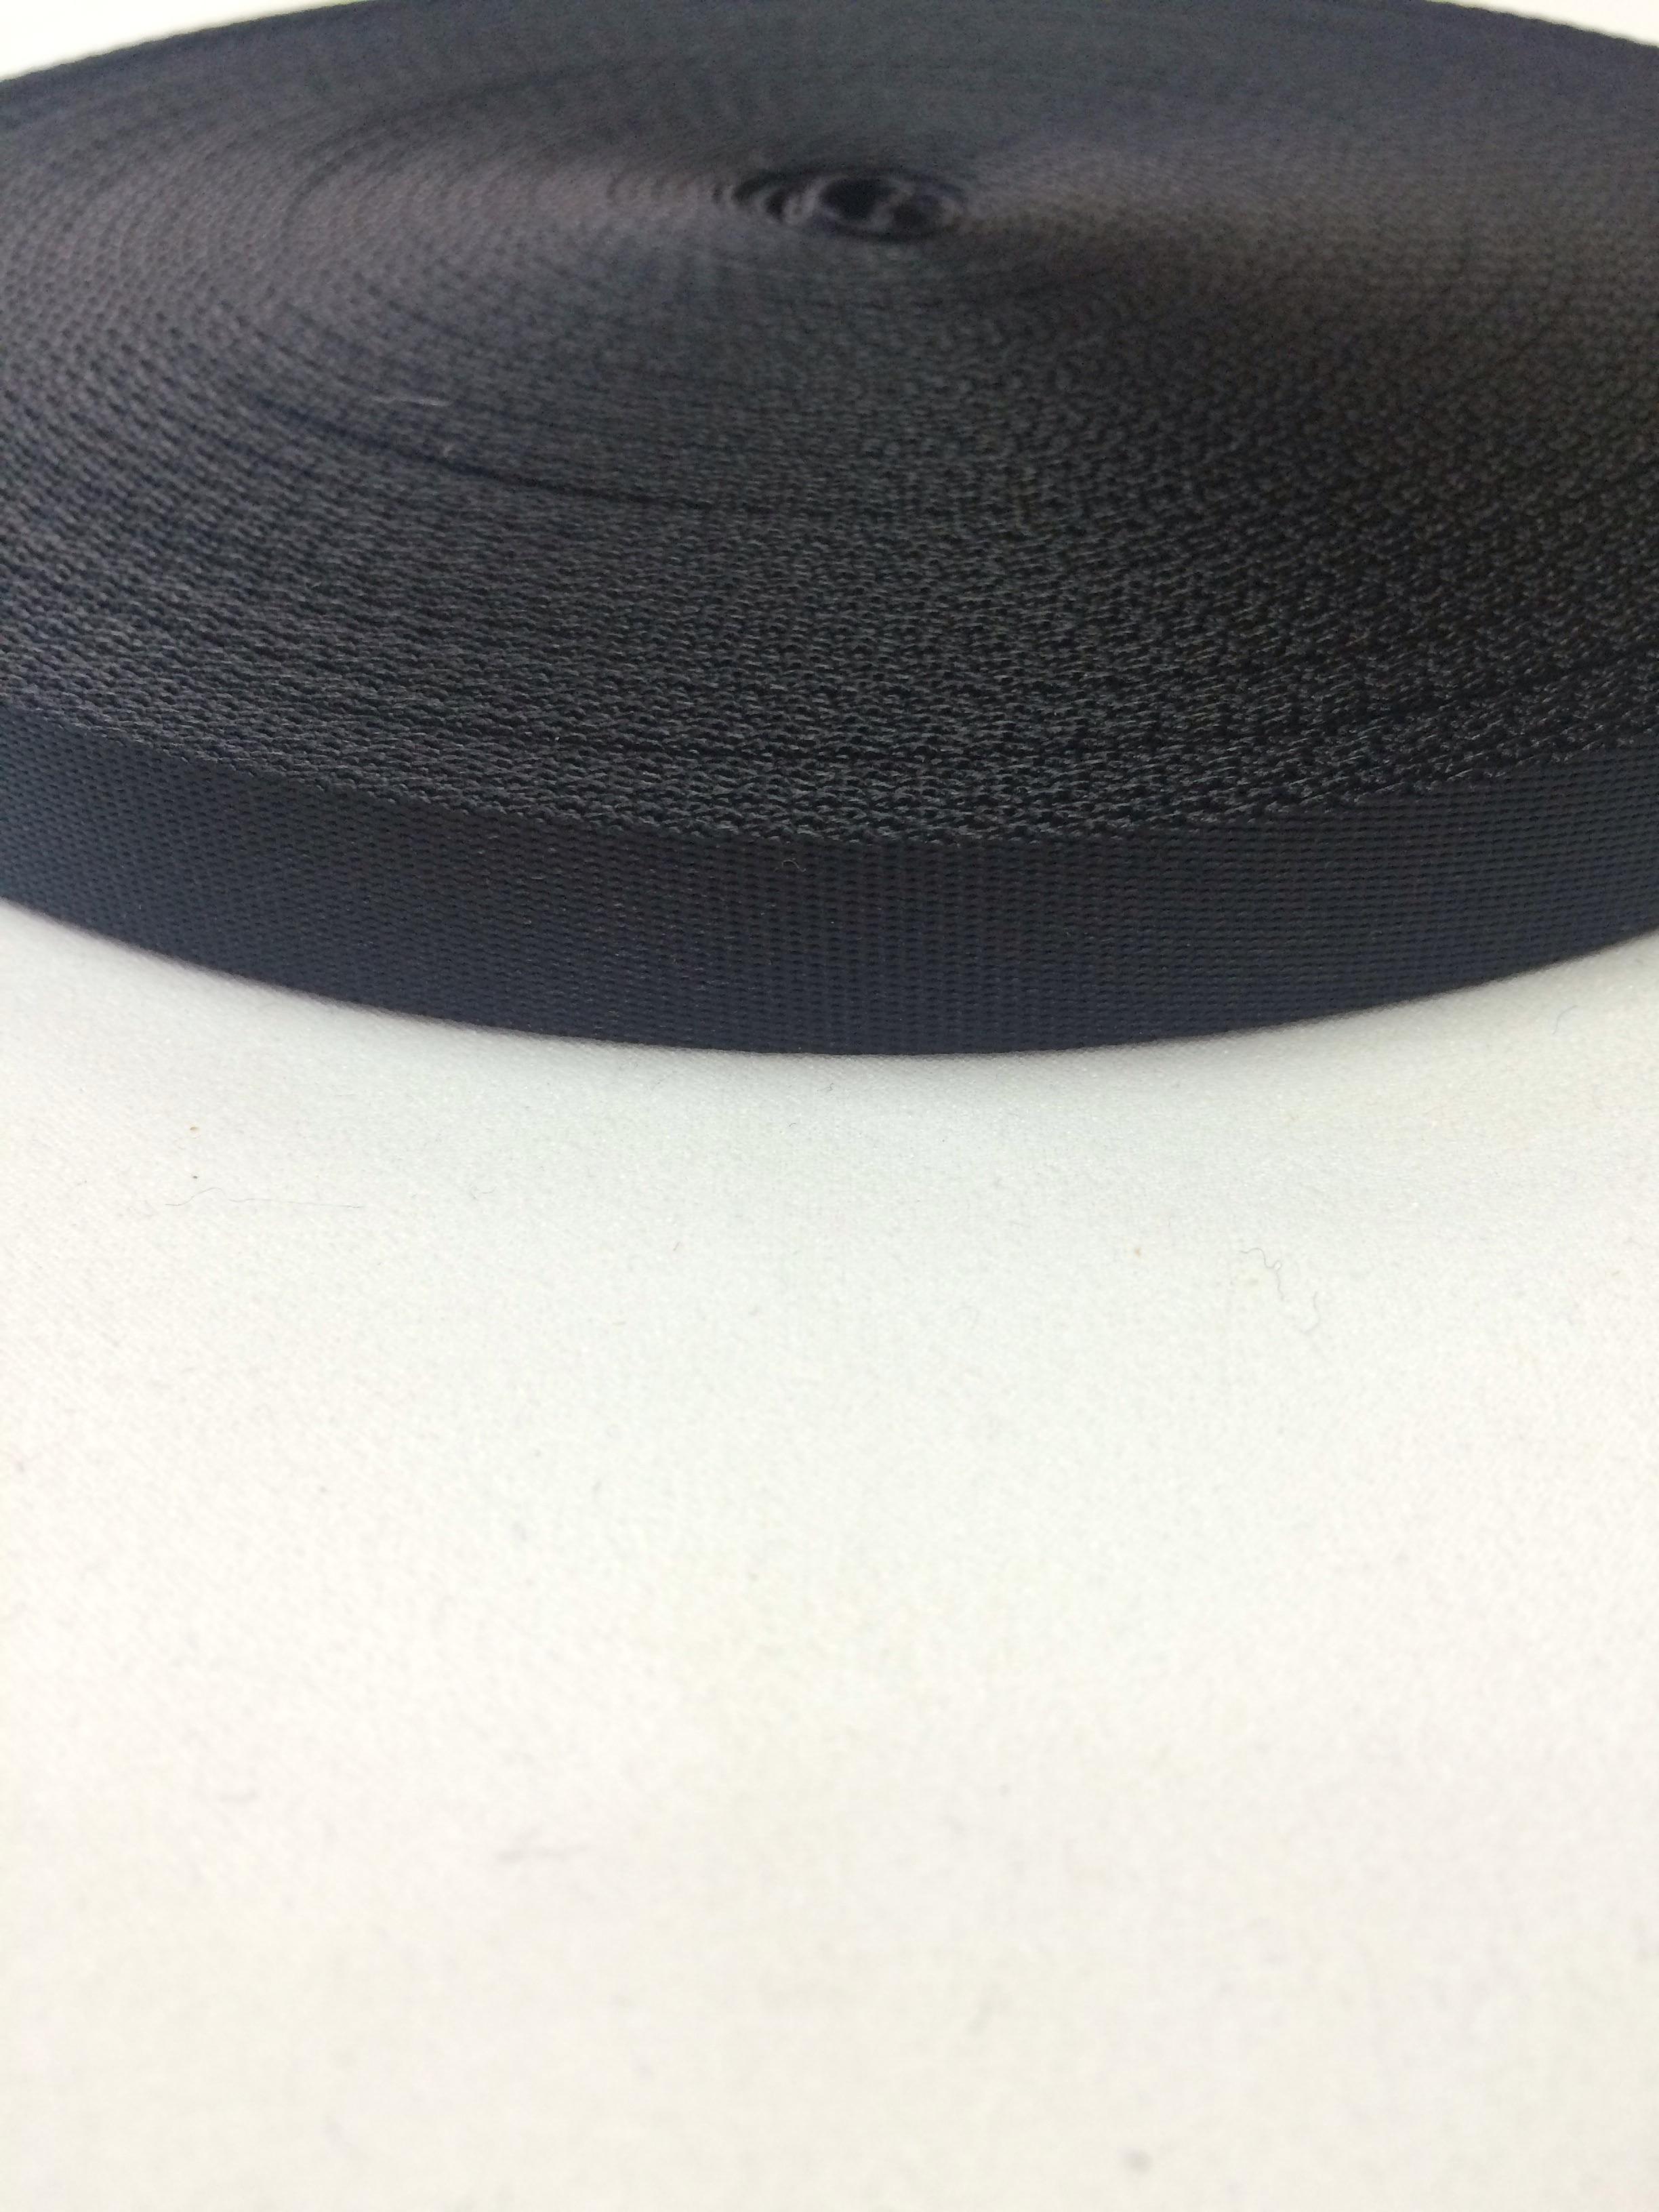 sale ナイロン  流綾織  15mm幅  1.1mm厚 黒  1反(50m)